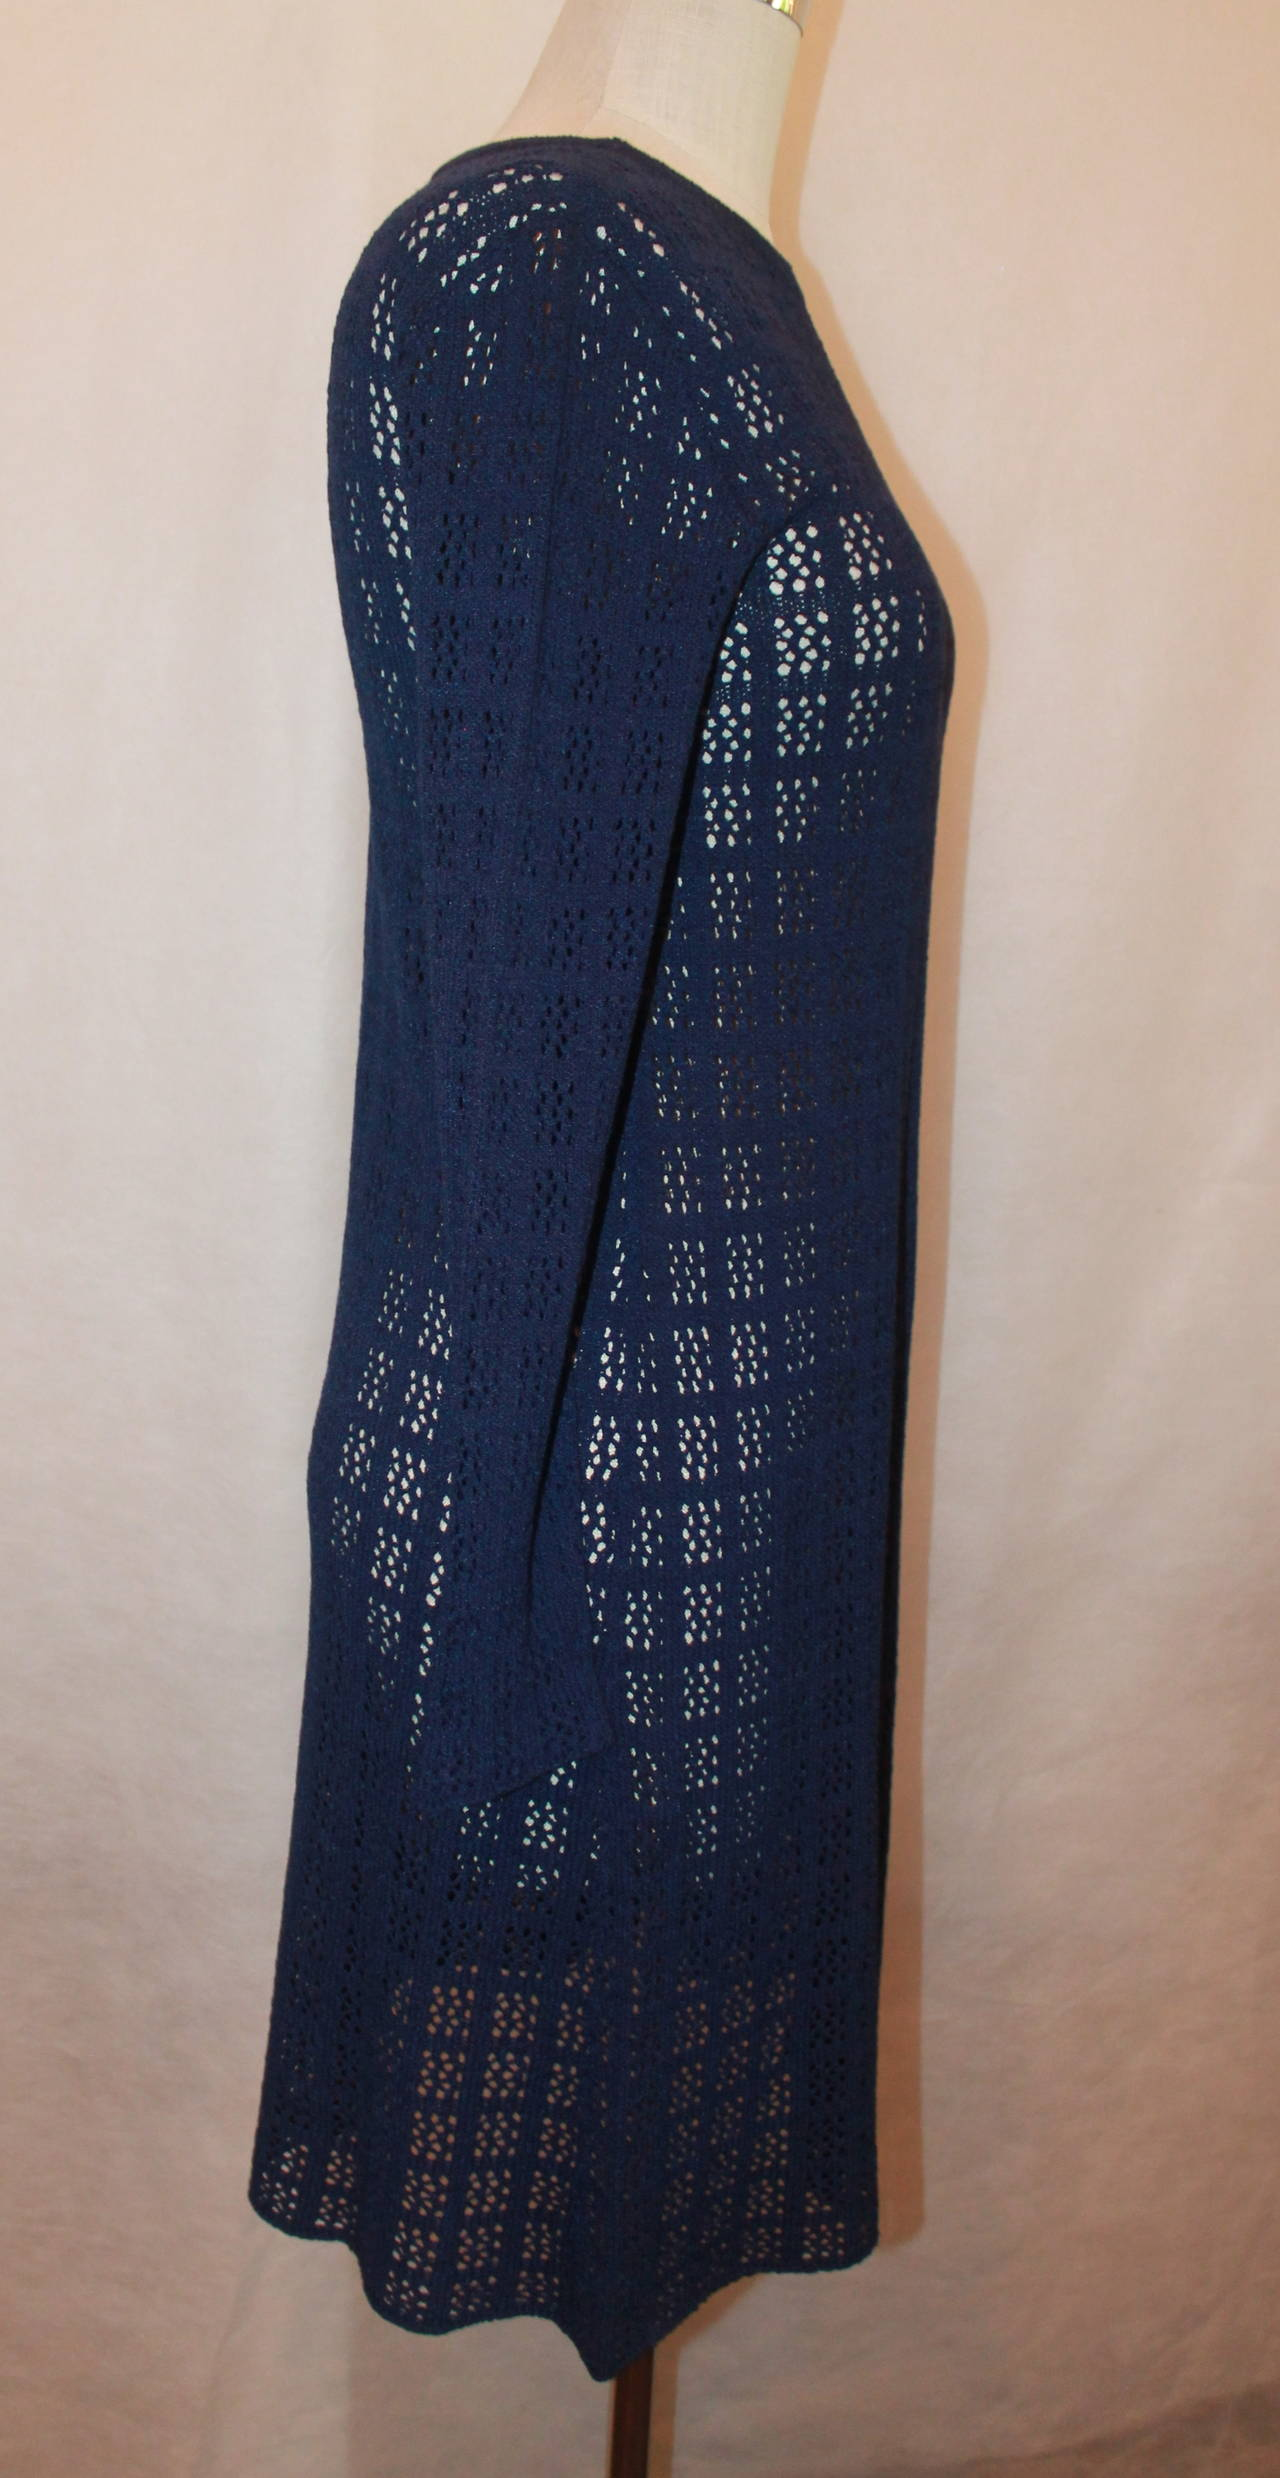 Adolfo 1960's Navy Open Knit Long Sleeve Dress - M 3